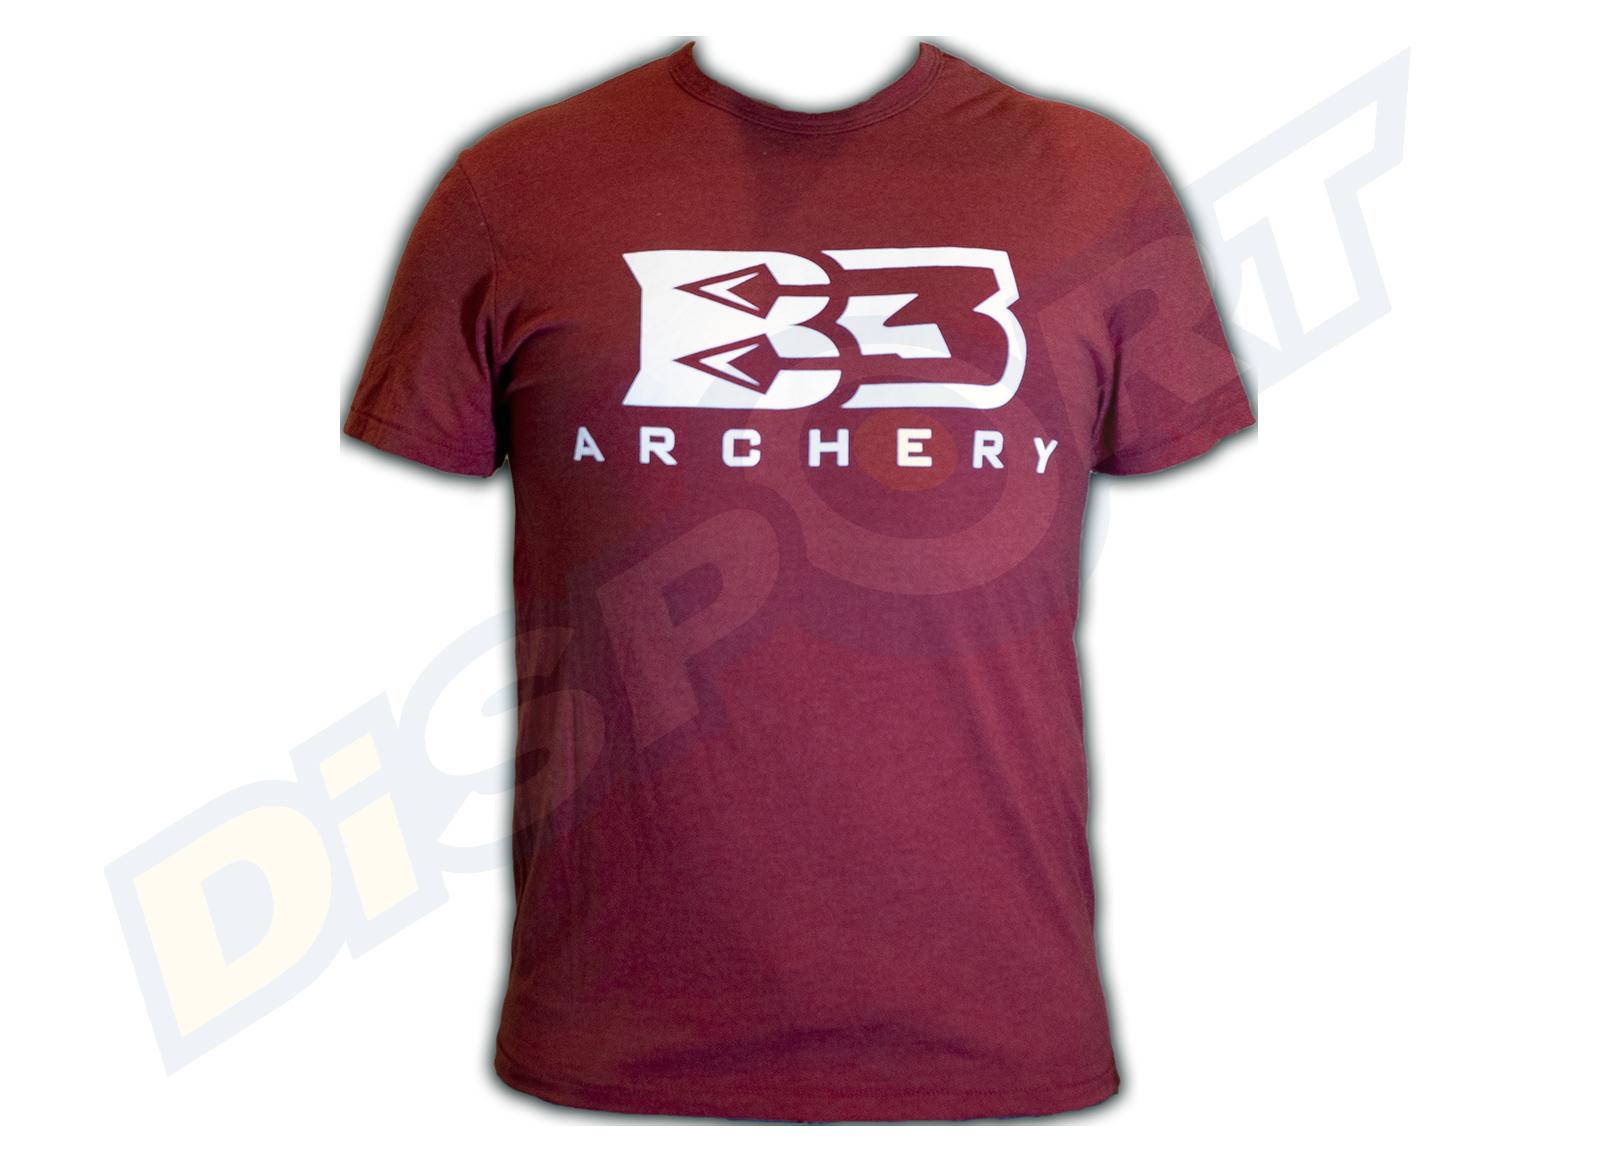 B3 ARCHERY BRAND T-SHIRT TEE